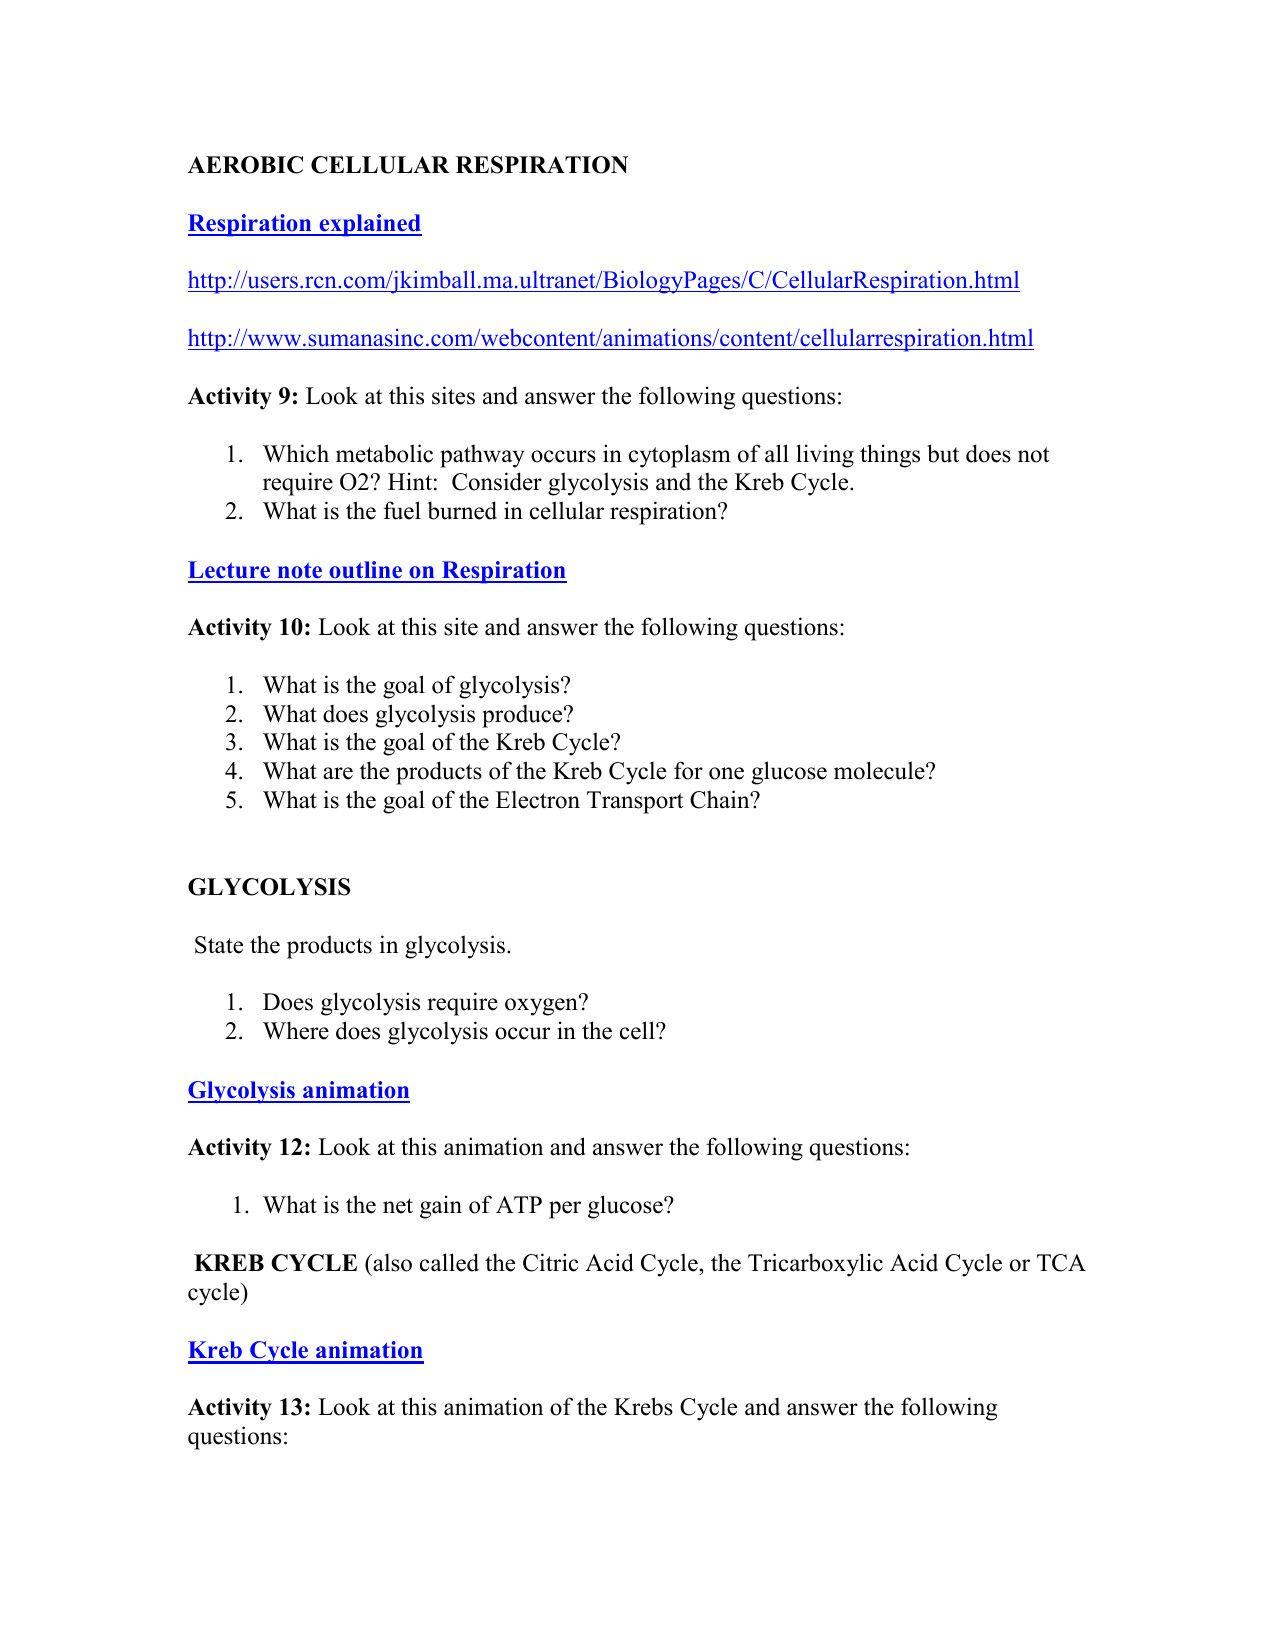 General Cellular Respiration Worksheet Answer Key